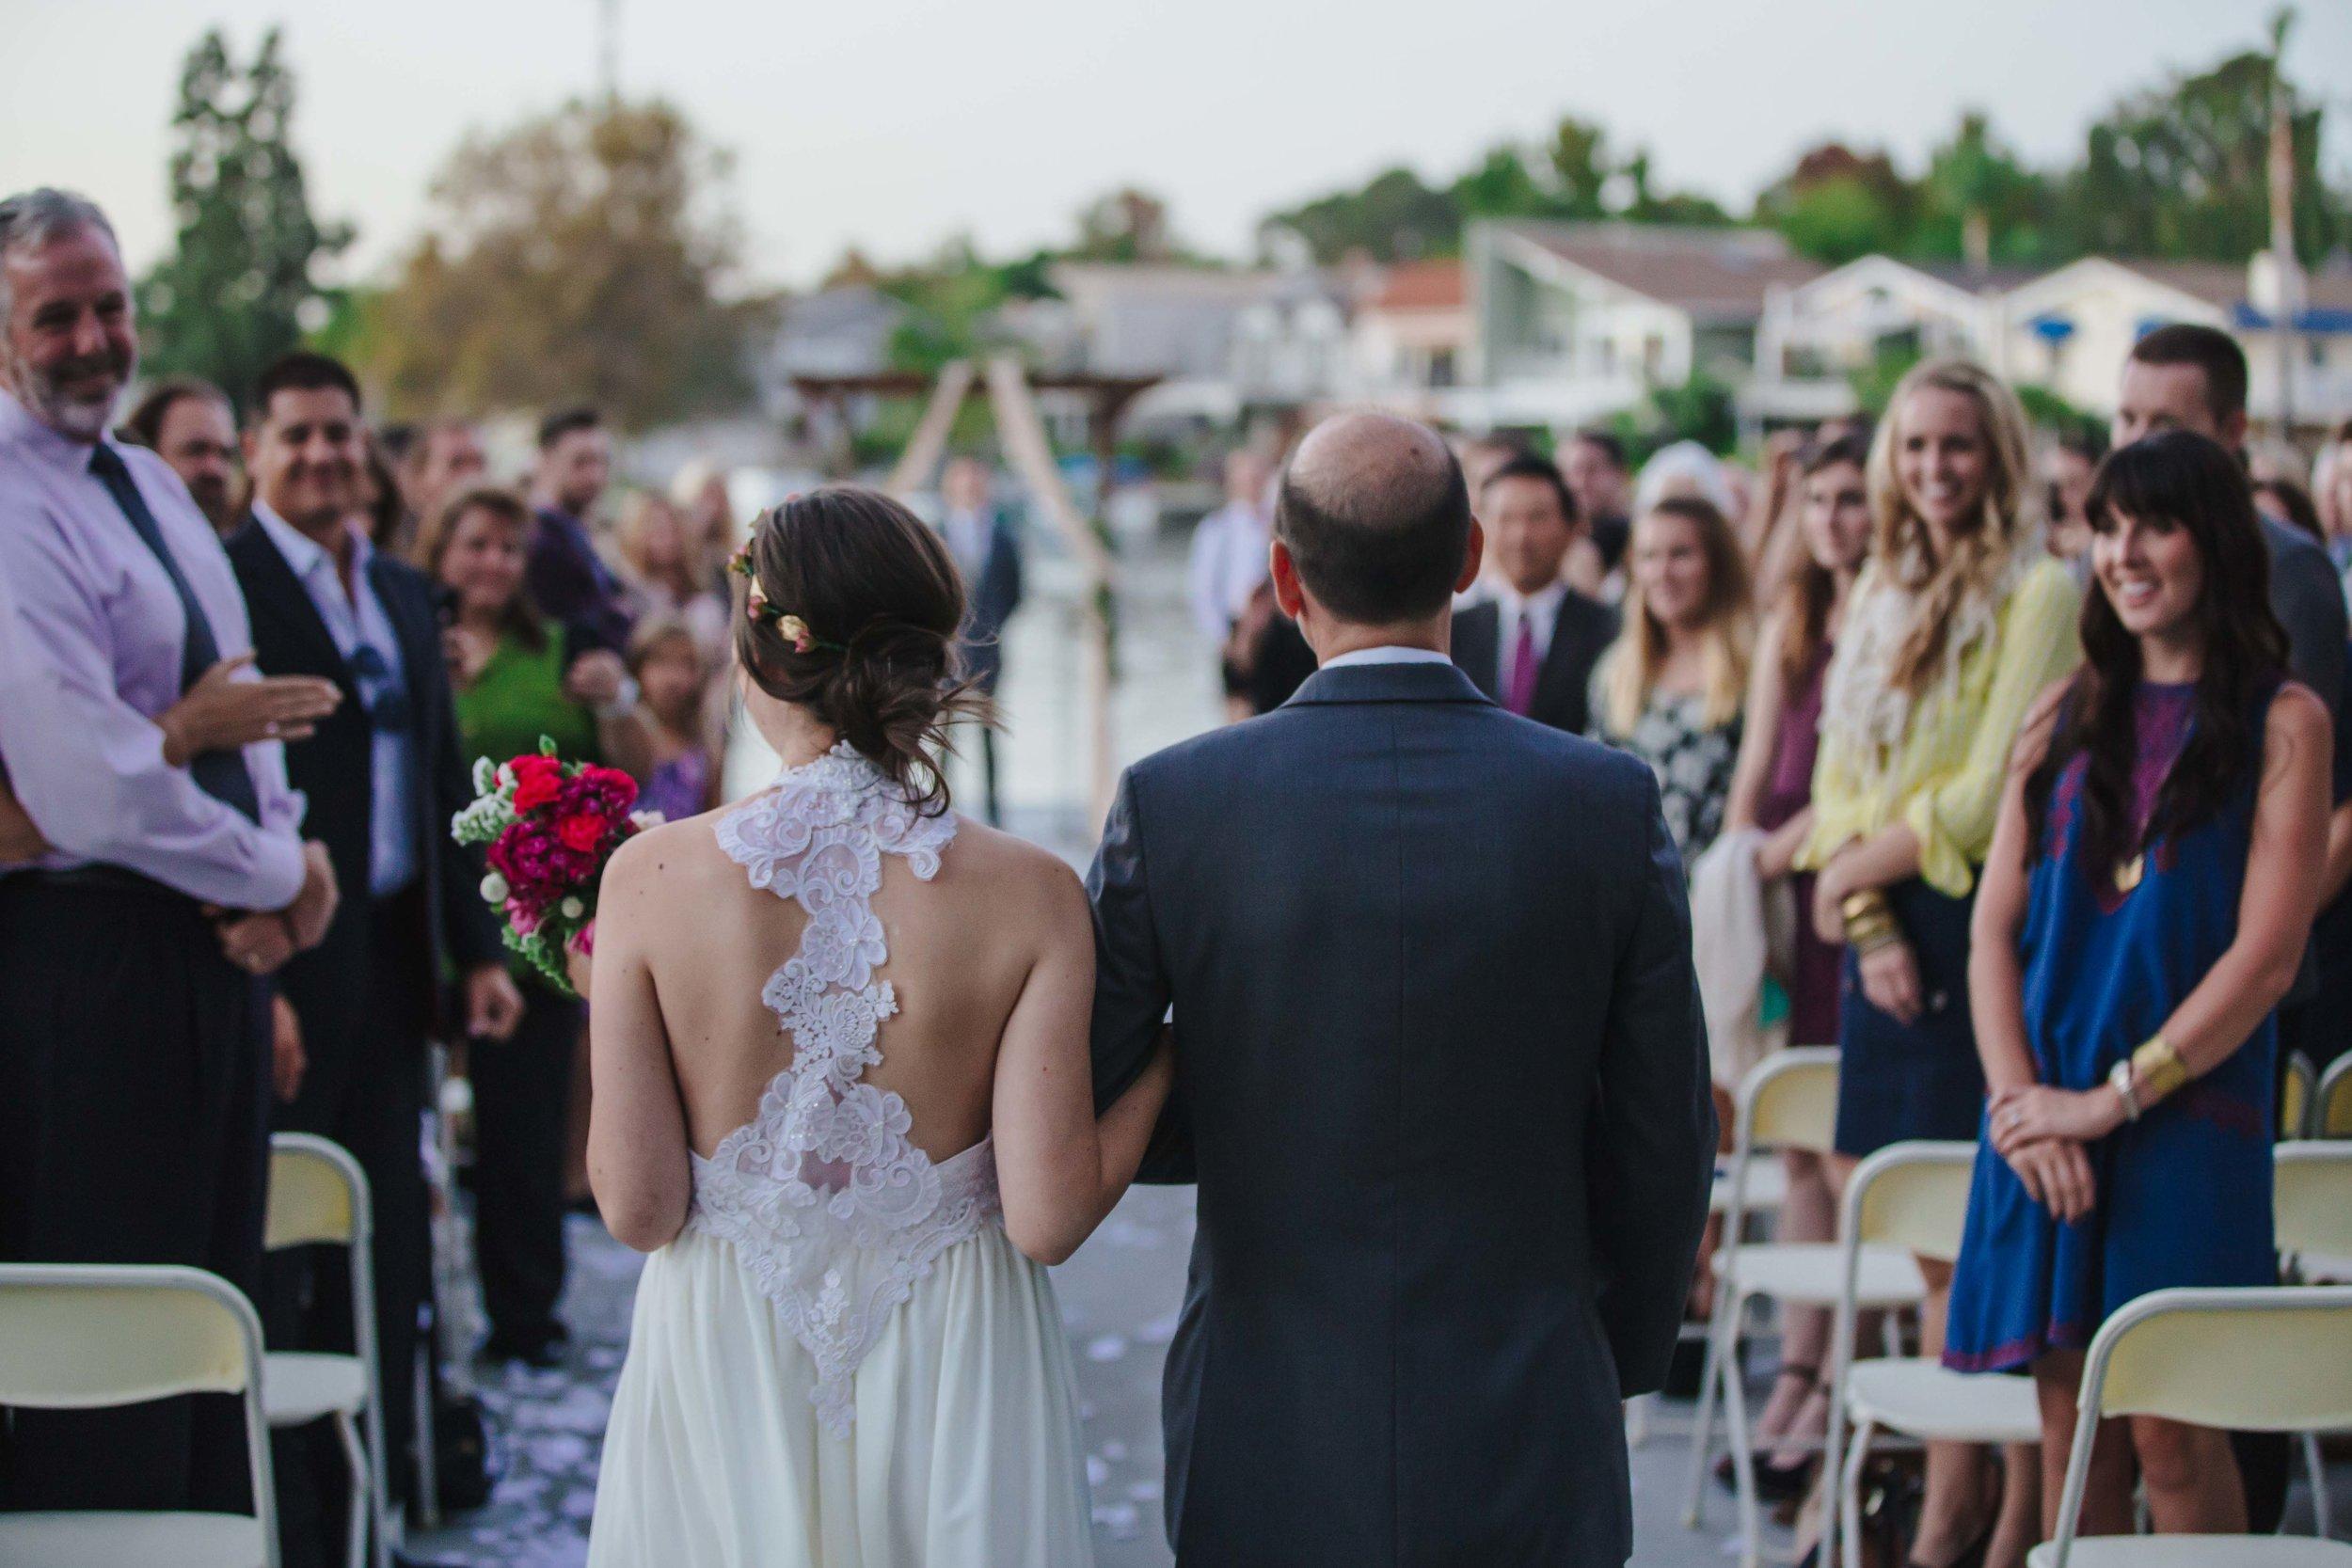 20141024-DePartee-Wedding-APavone-049-sm.jpg